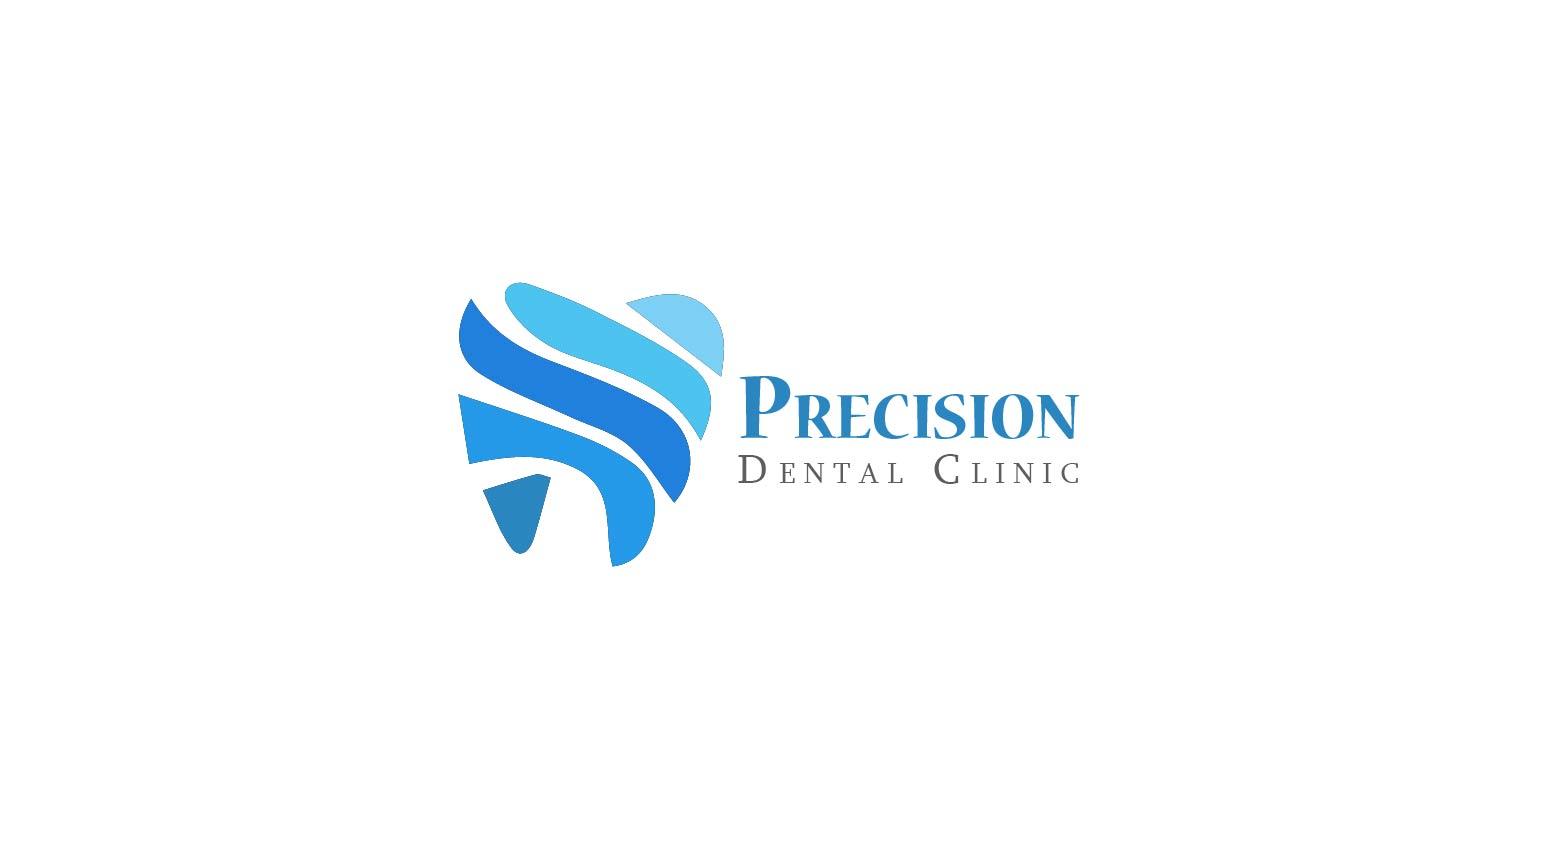 Logo Design by Muazzama Memon - Entry No. 166 in the Logo Design Contest Captivating Logo Design for Precision Dental Clinic.